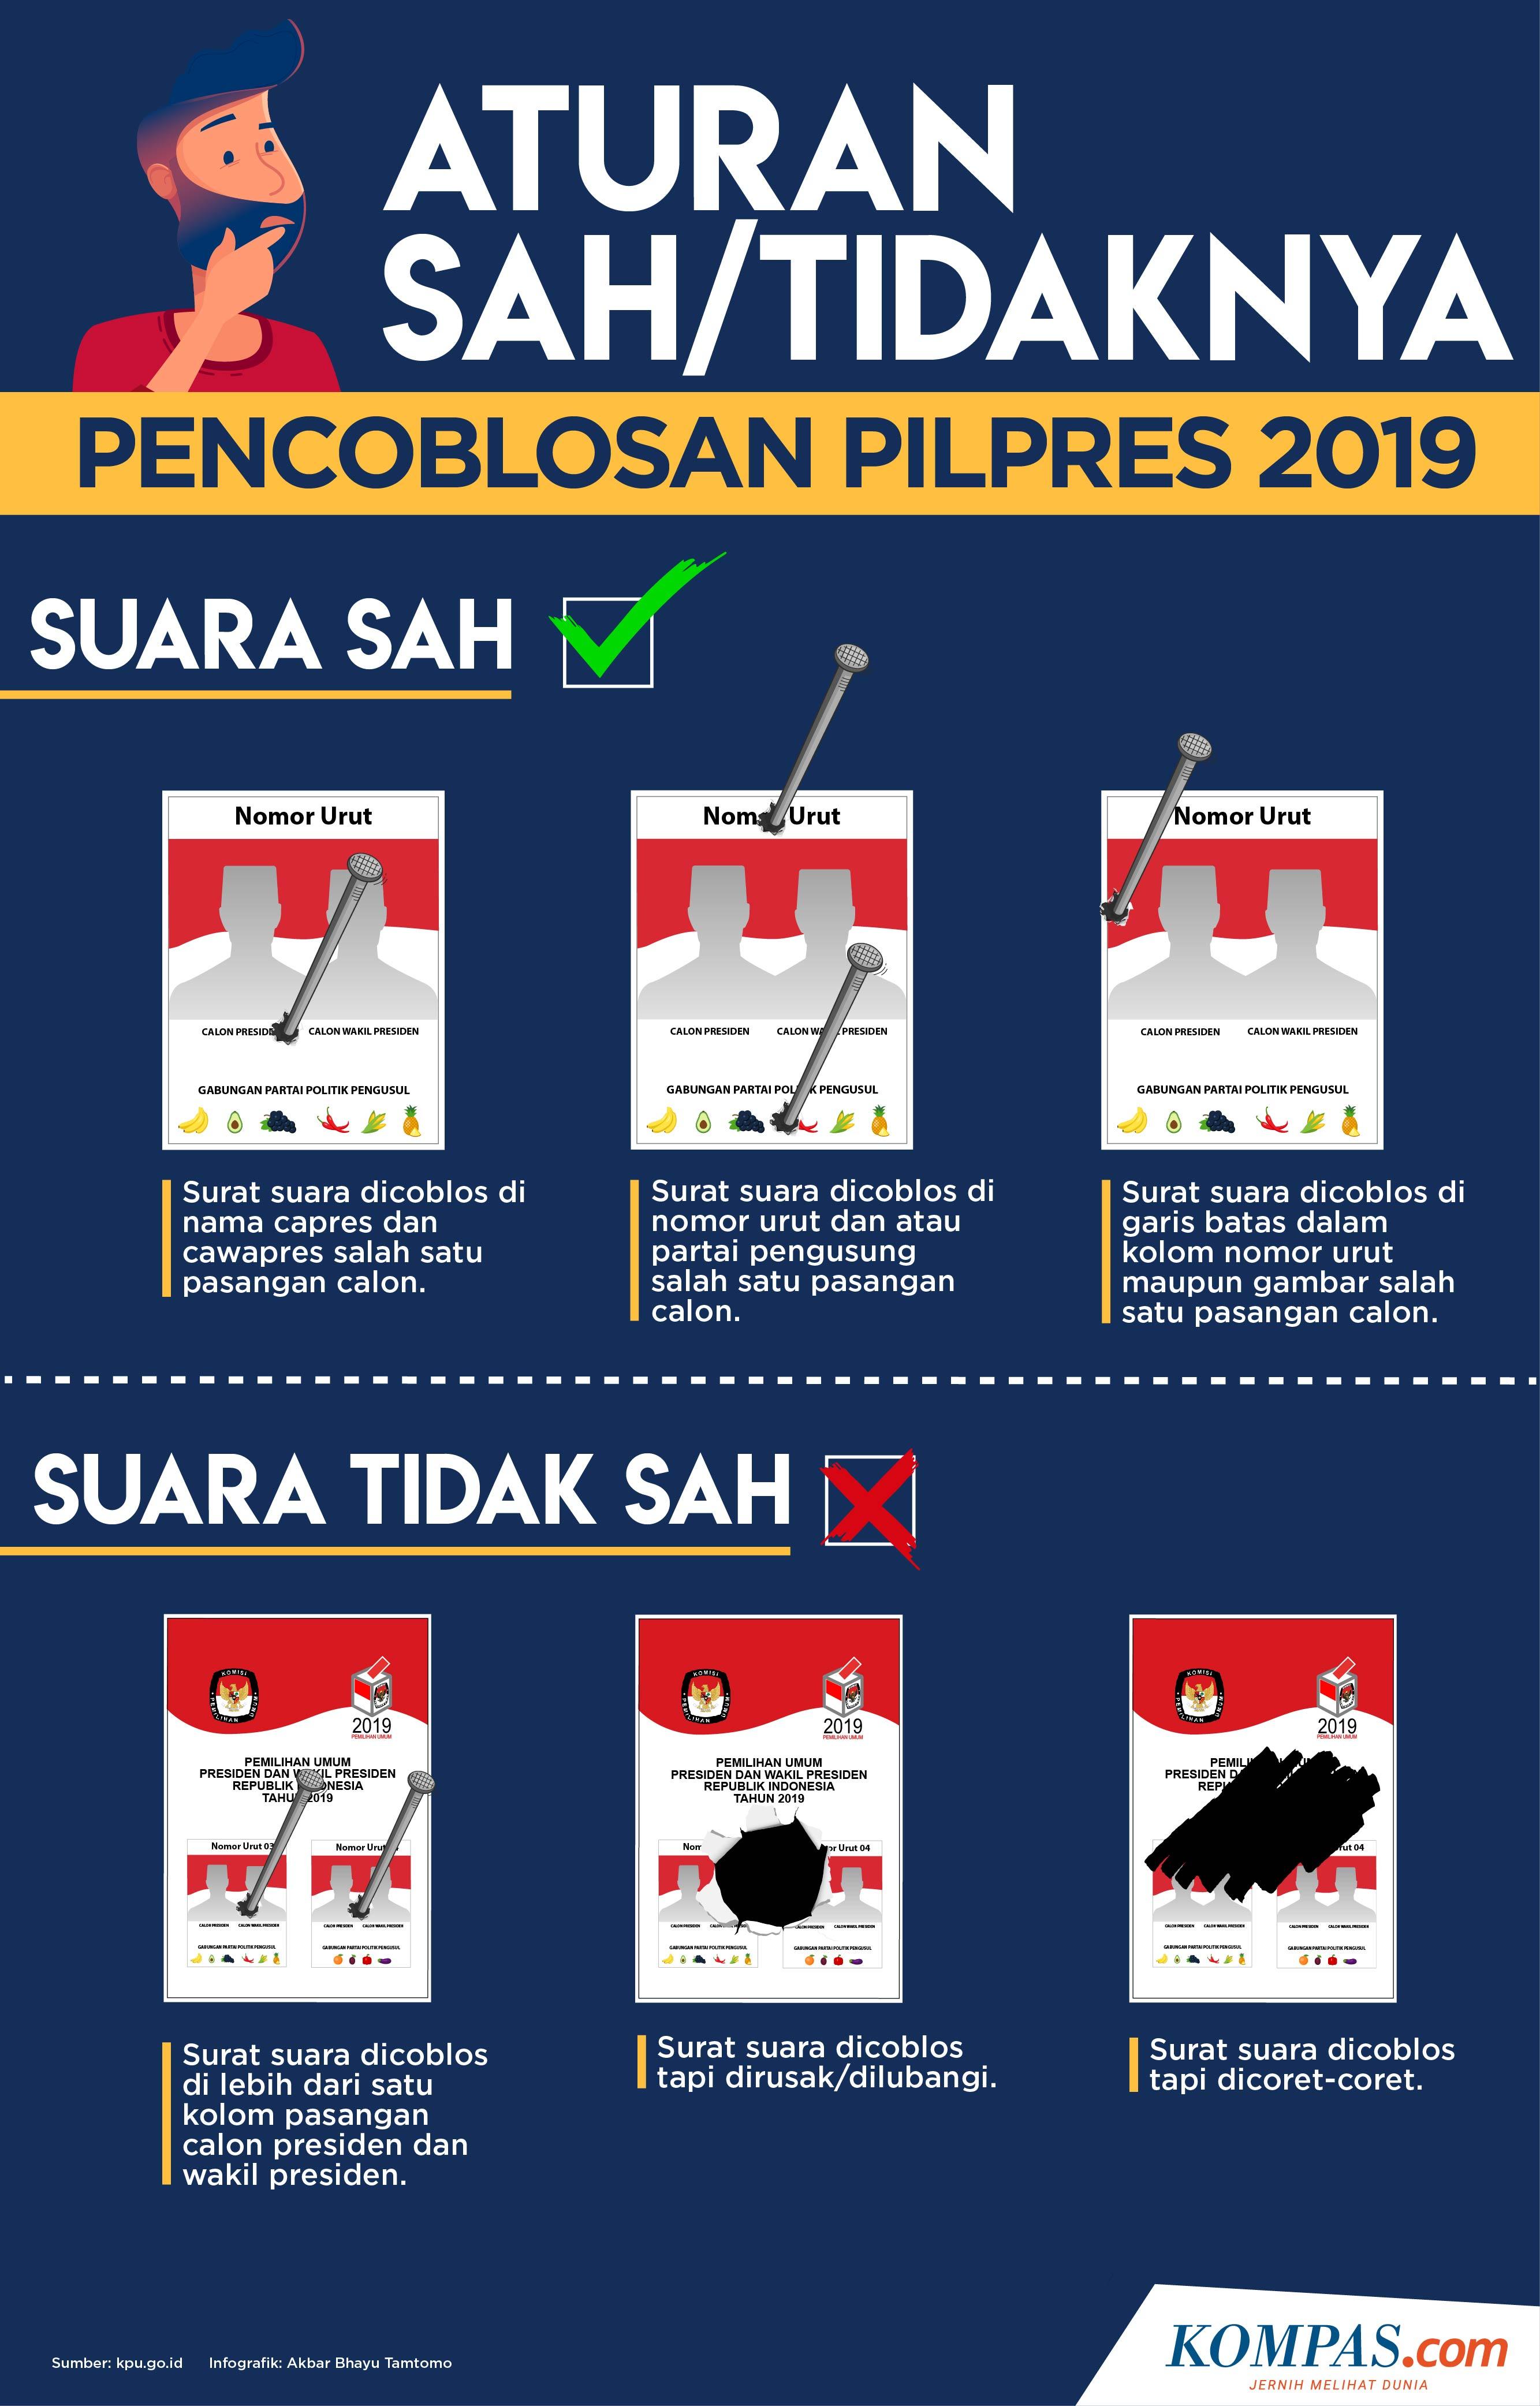 Infografik: Aturan Sah/Tidaknya Pencoblosan Pilpres 2019